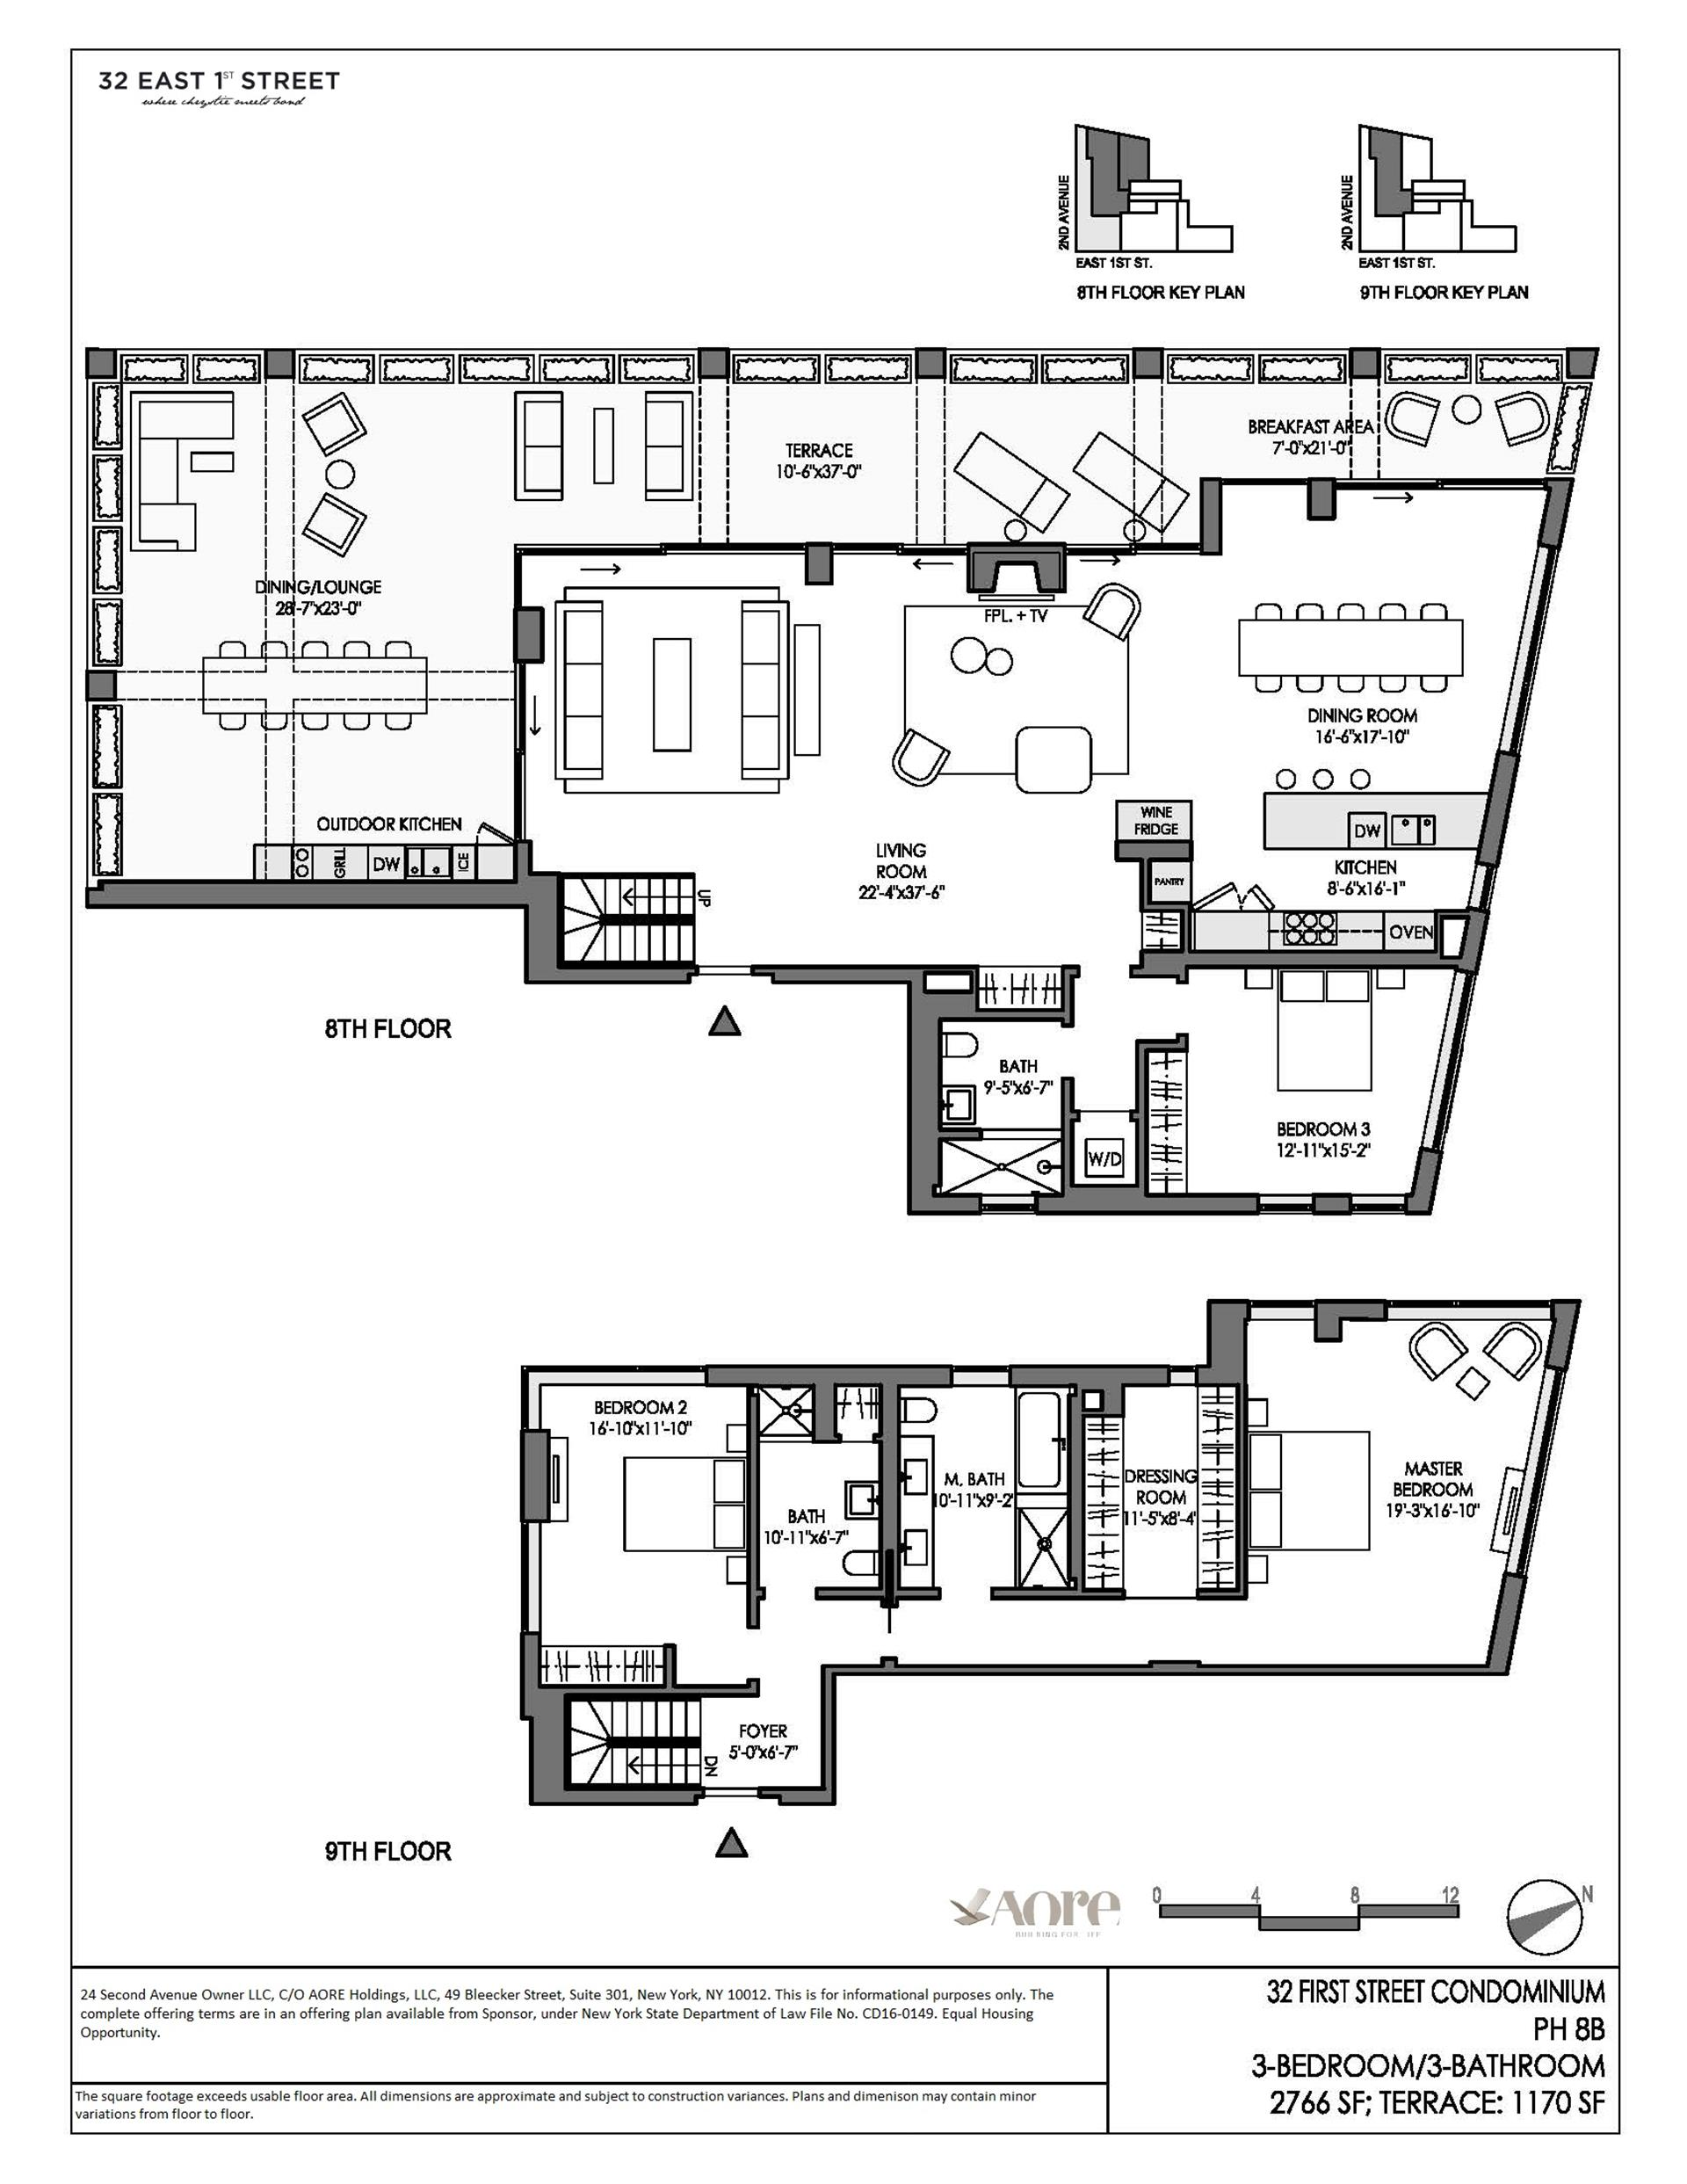 Floor plan of 32 East 1st St, PHB - East Village, New York